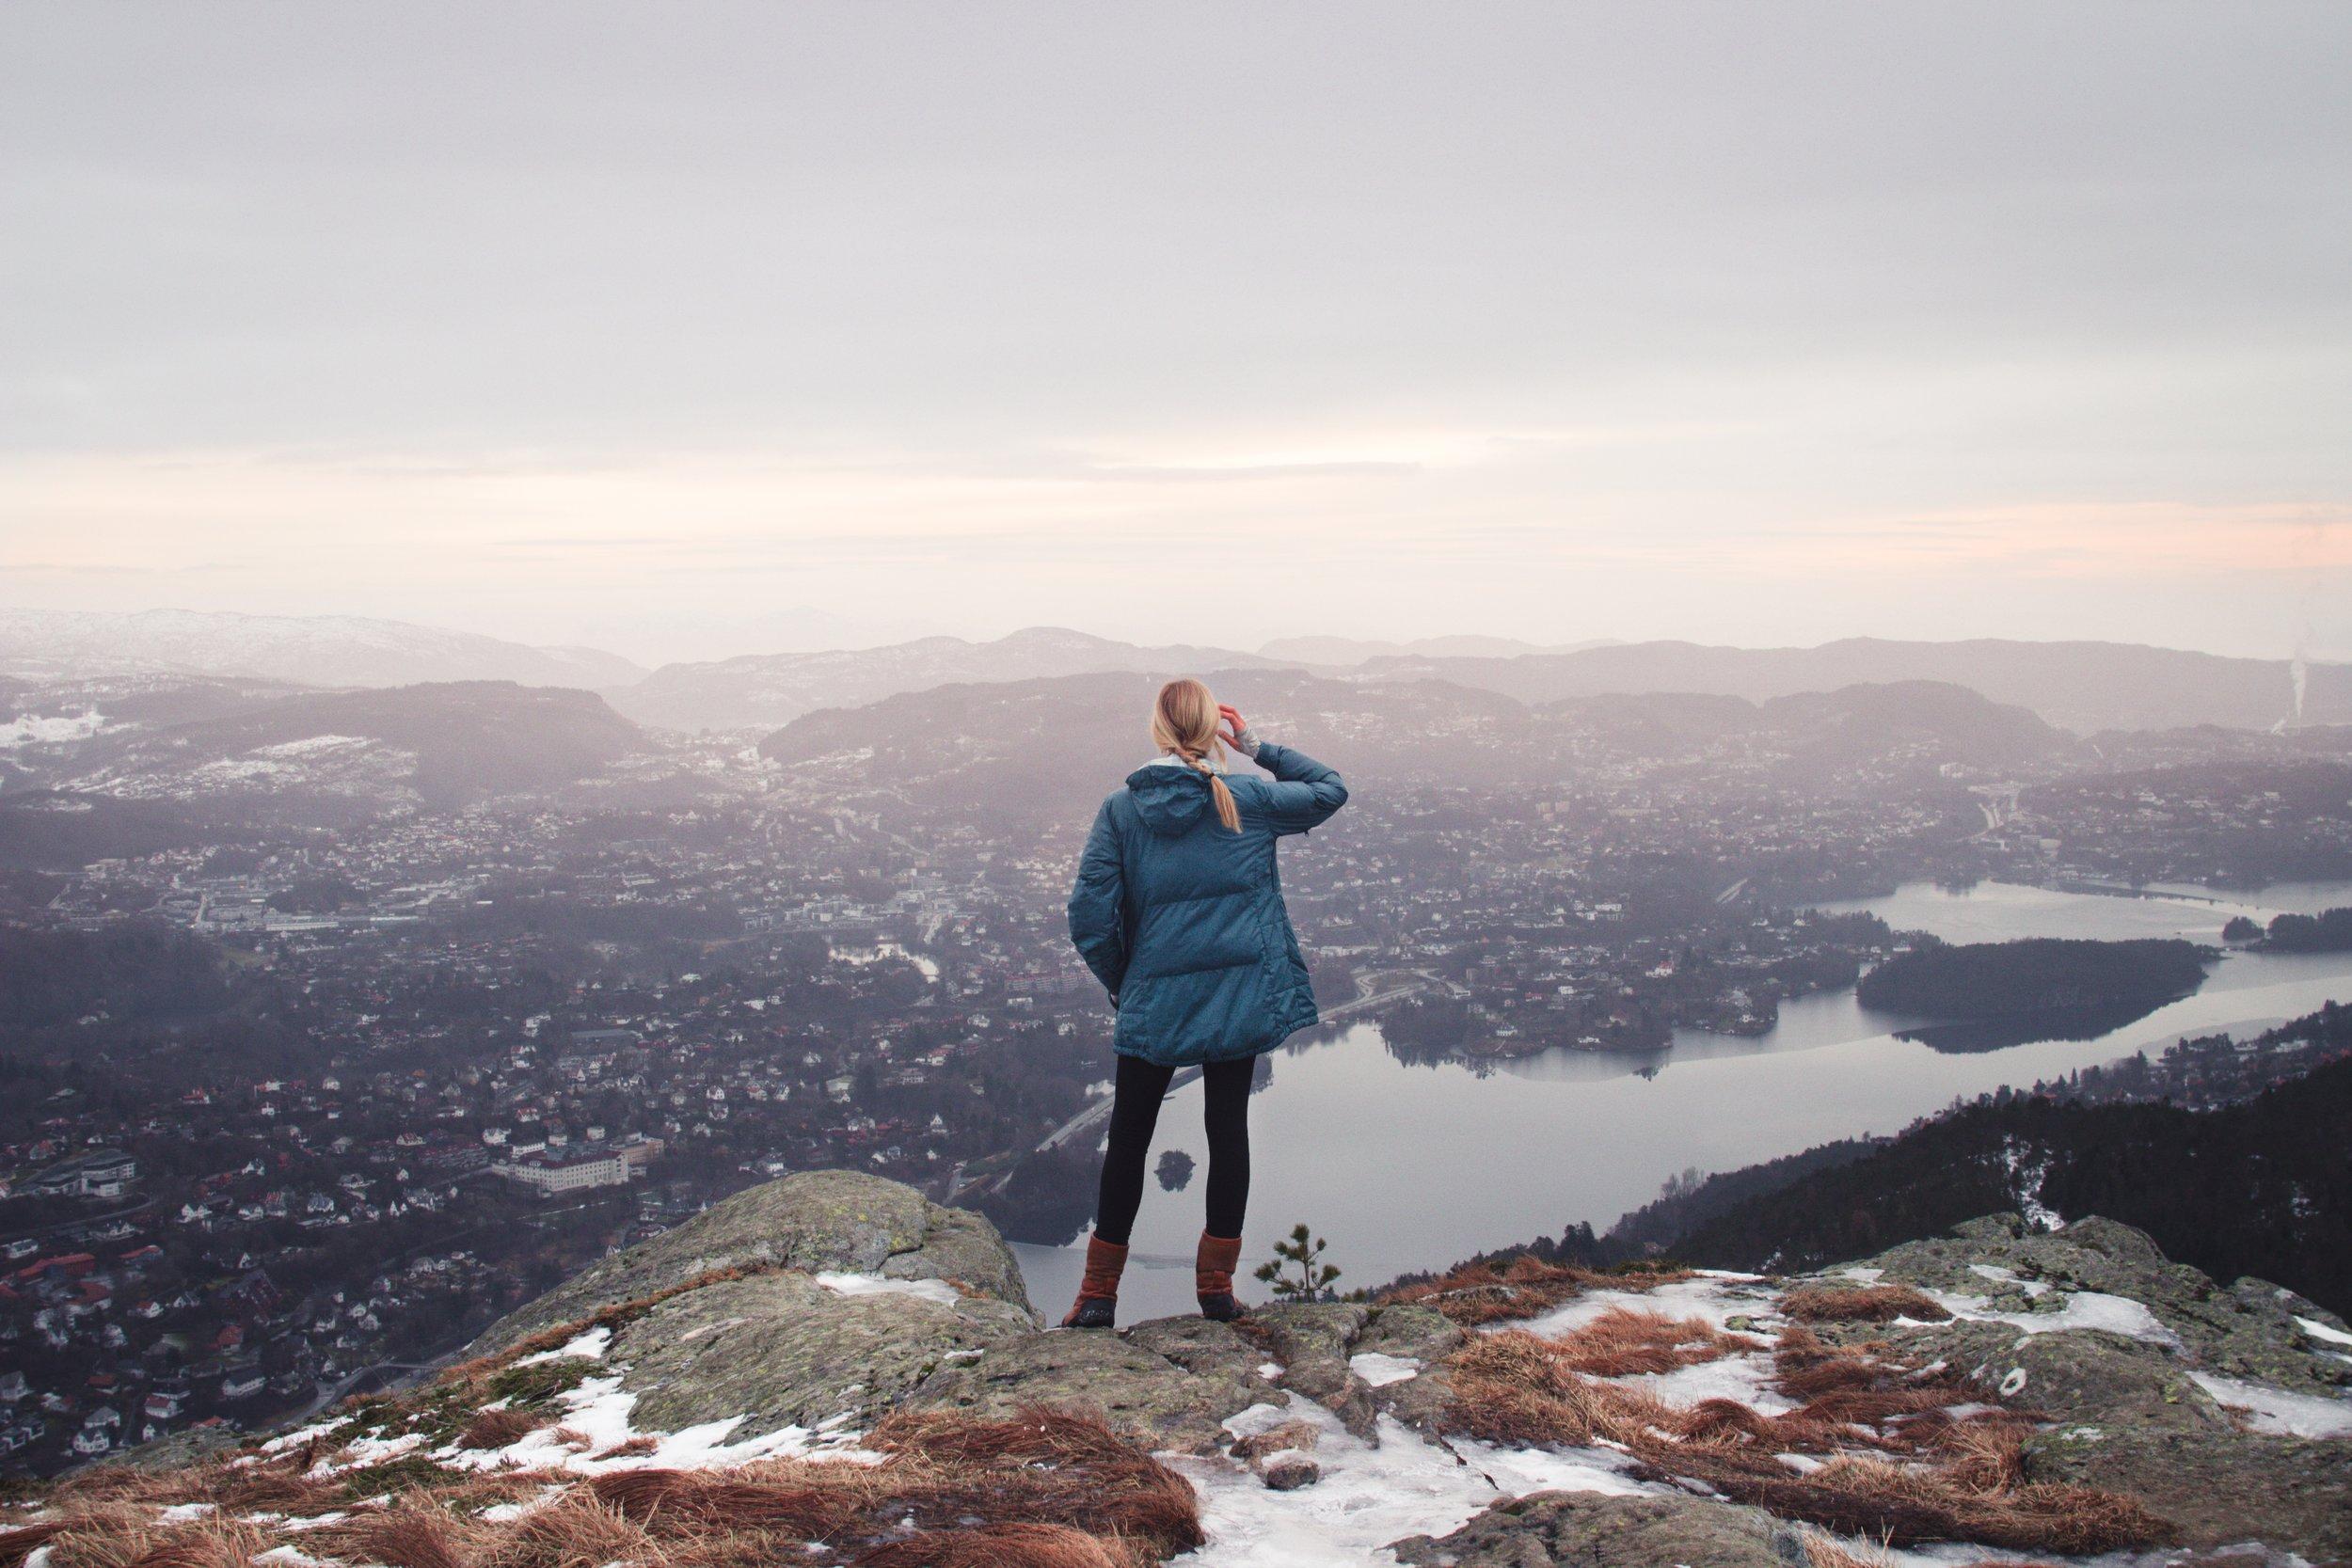 landscape-walking-mountain-girl-woman-hiking-1385909-pxhere.com.jpg